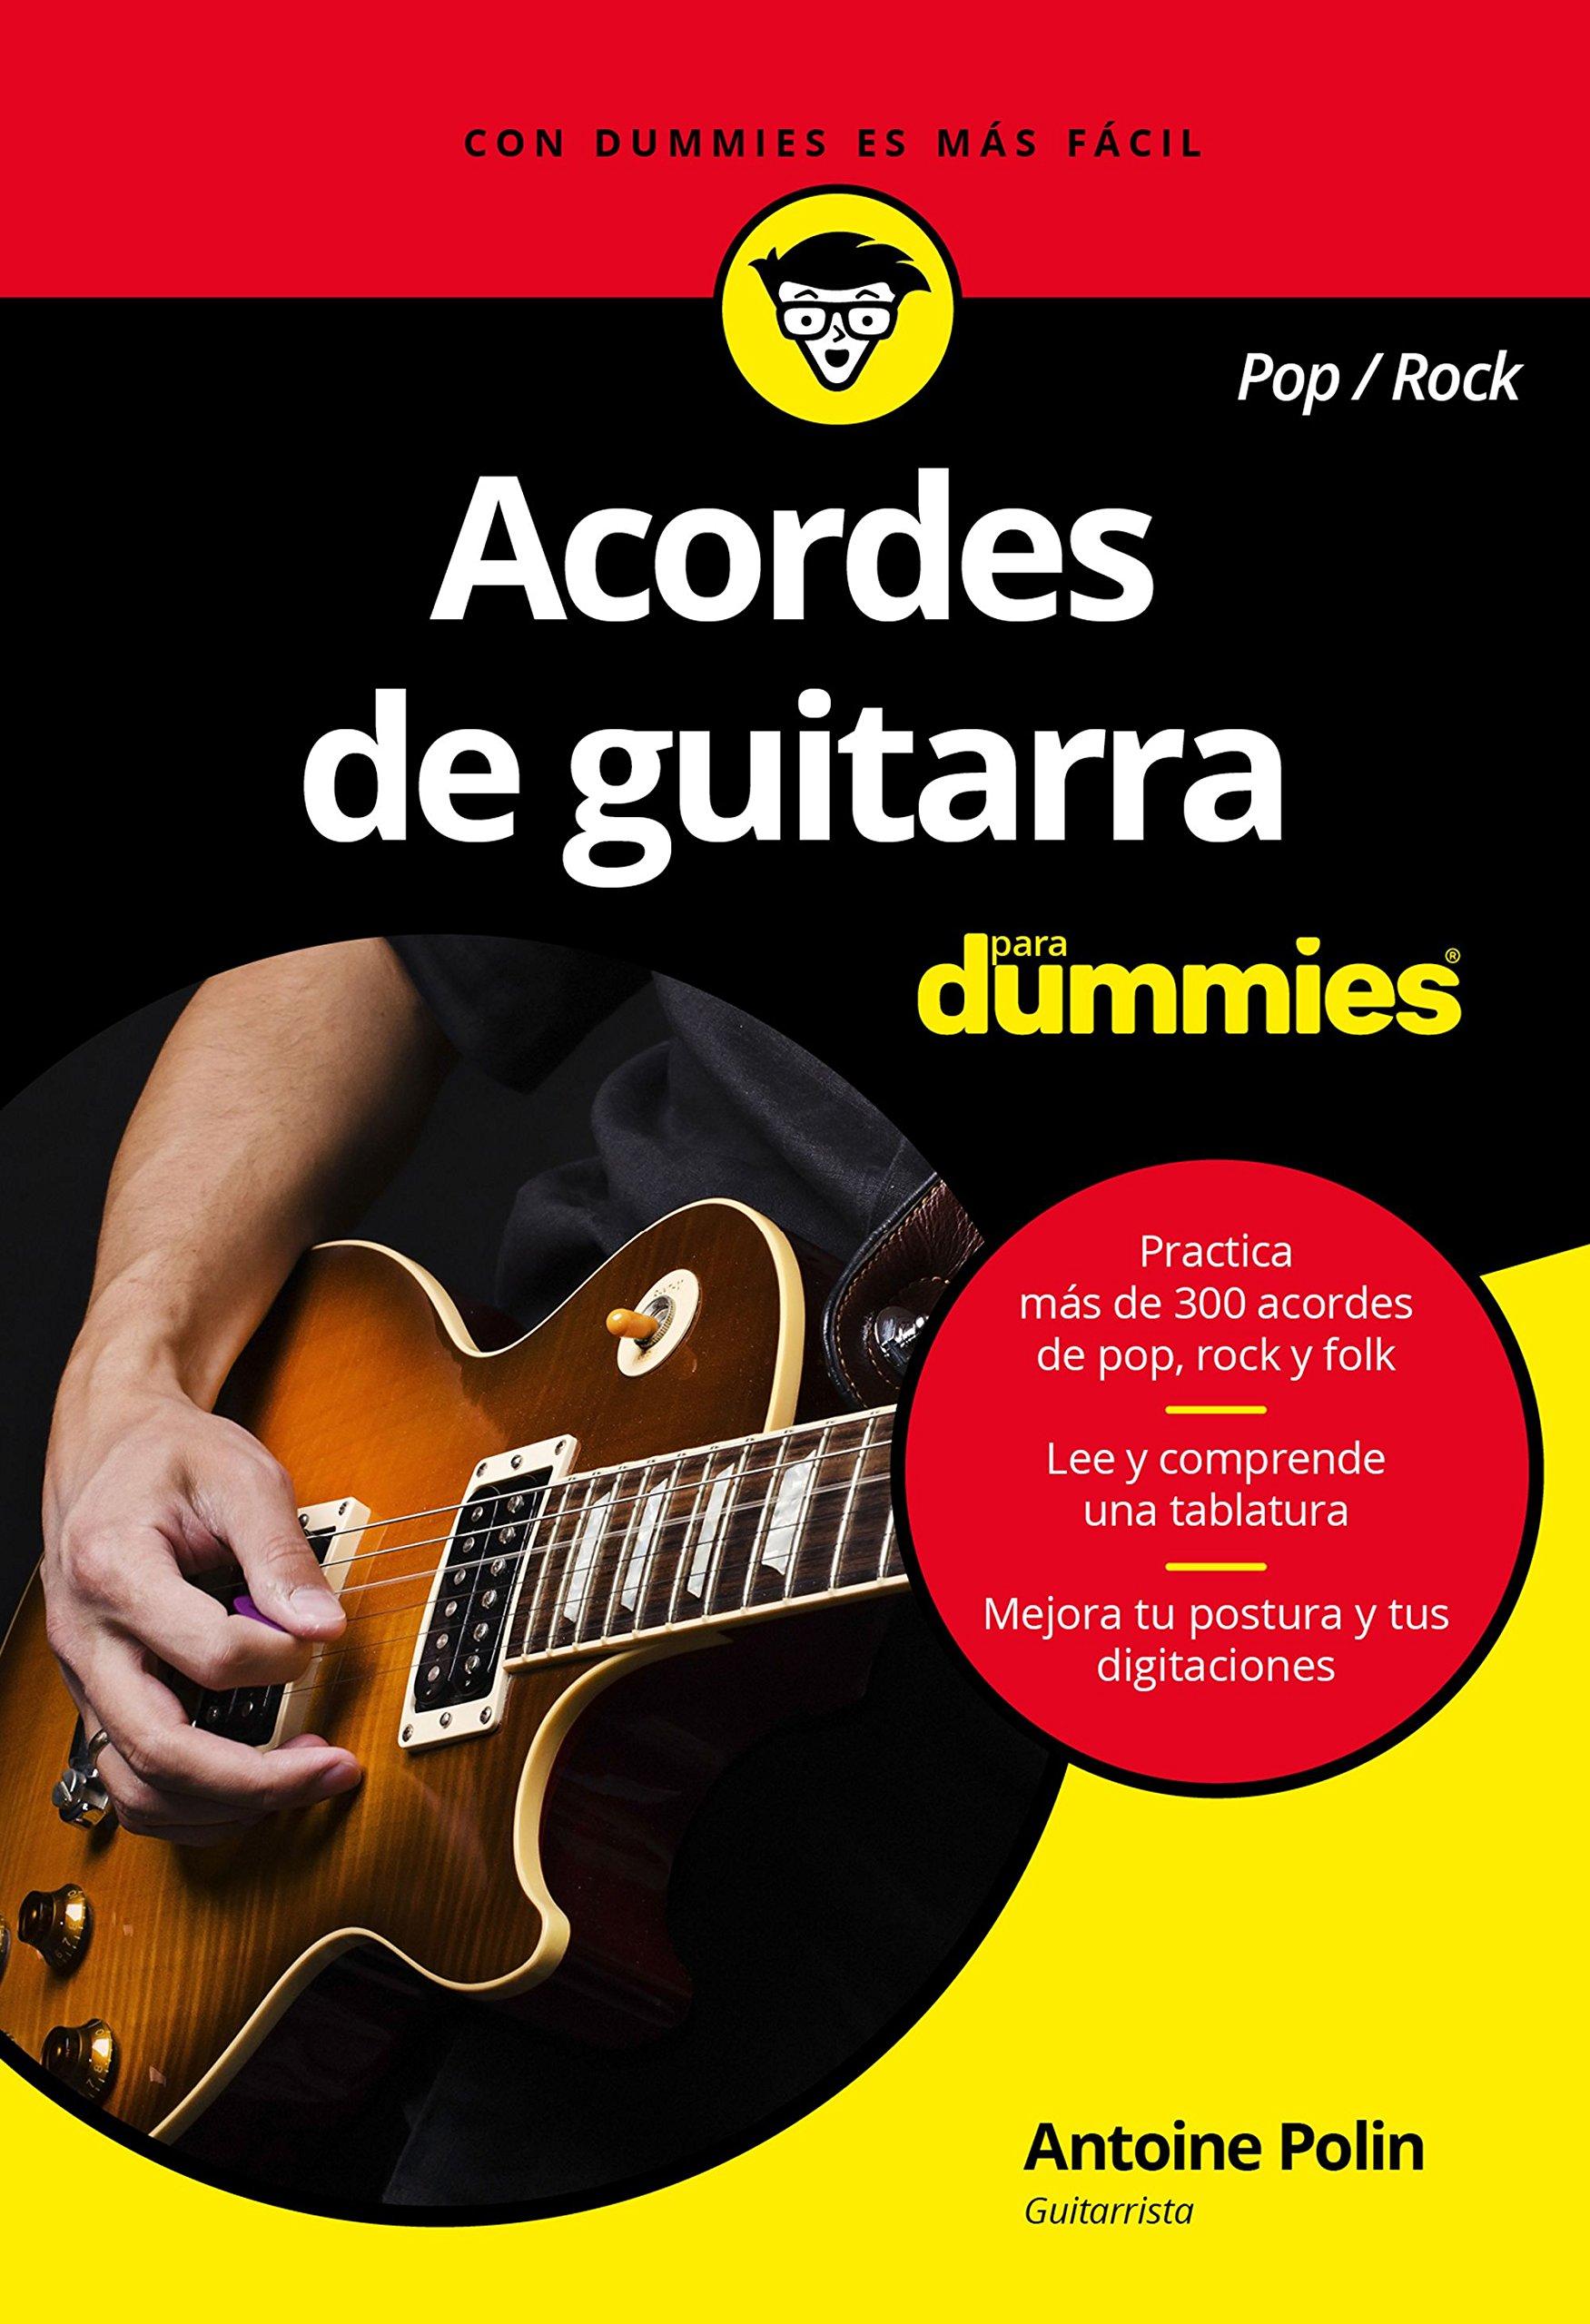 Acordes de guitarra pop/rock para Dummies: Amazon.es: Antoine Polin, Paula González Fernández: Libros